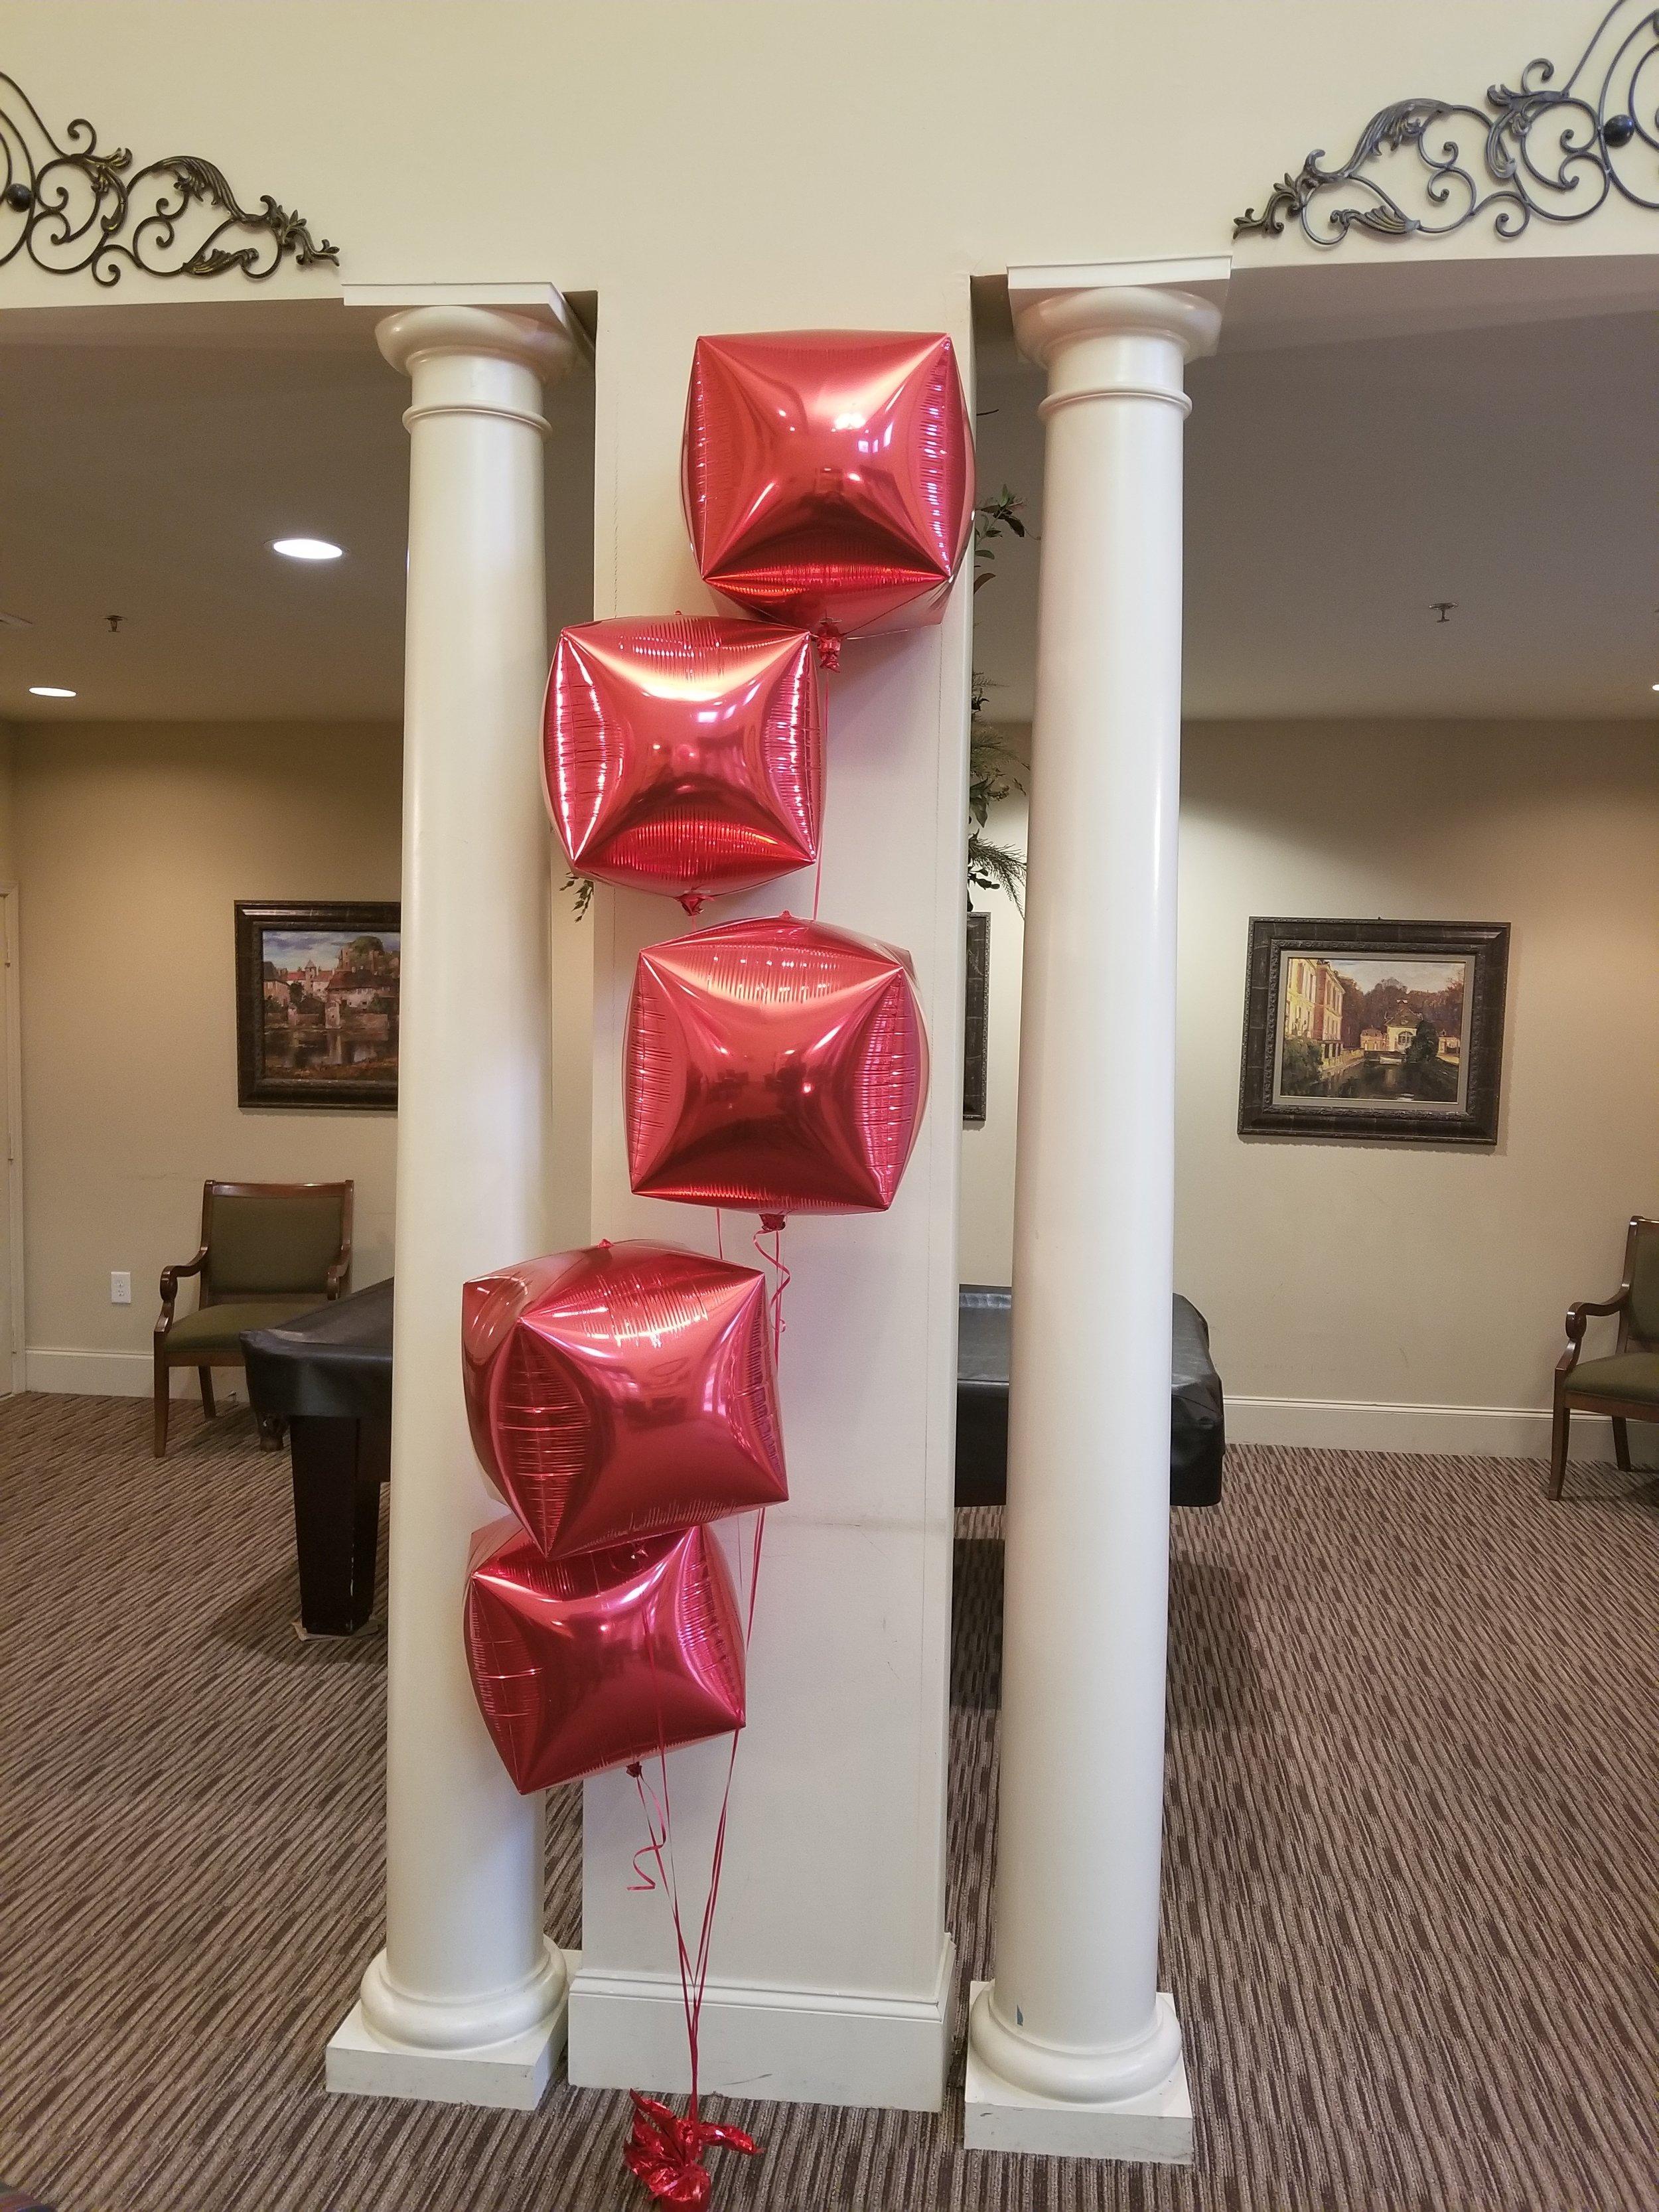 red cubez balloons.jpg